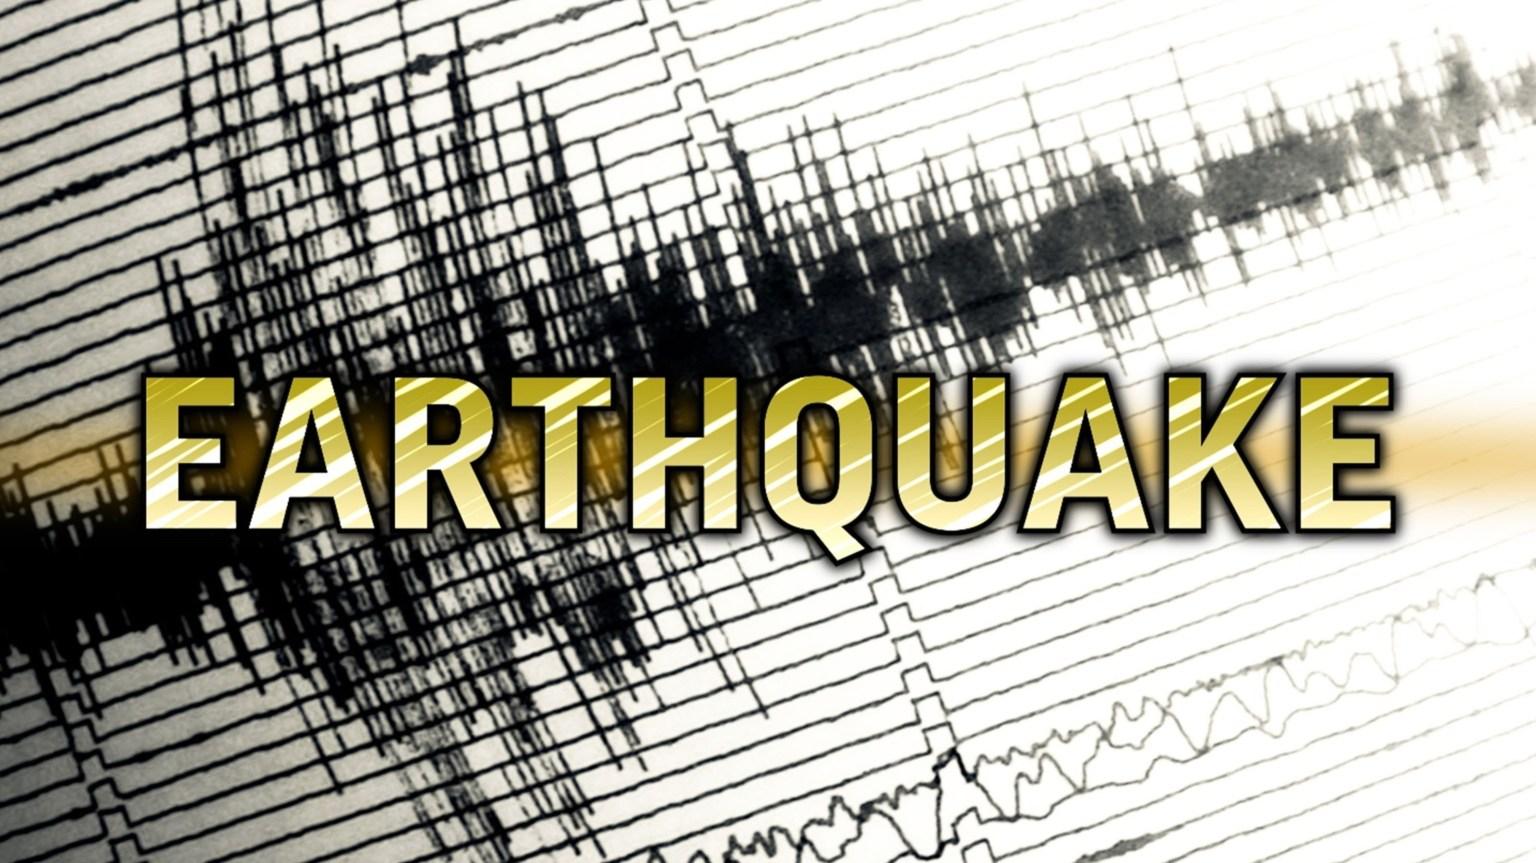 Earthquake Strikes in Rural Riverside County East of Temecula